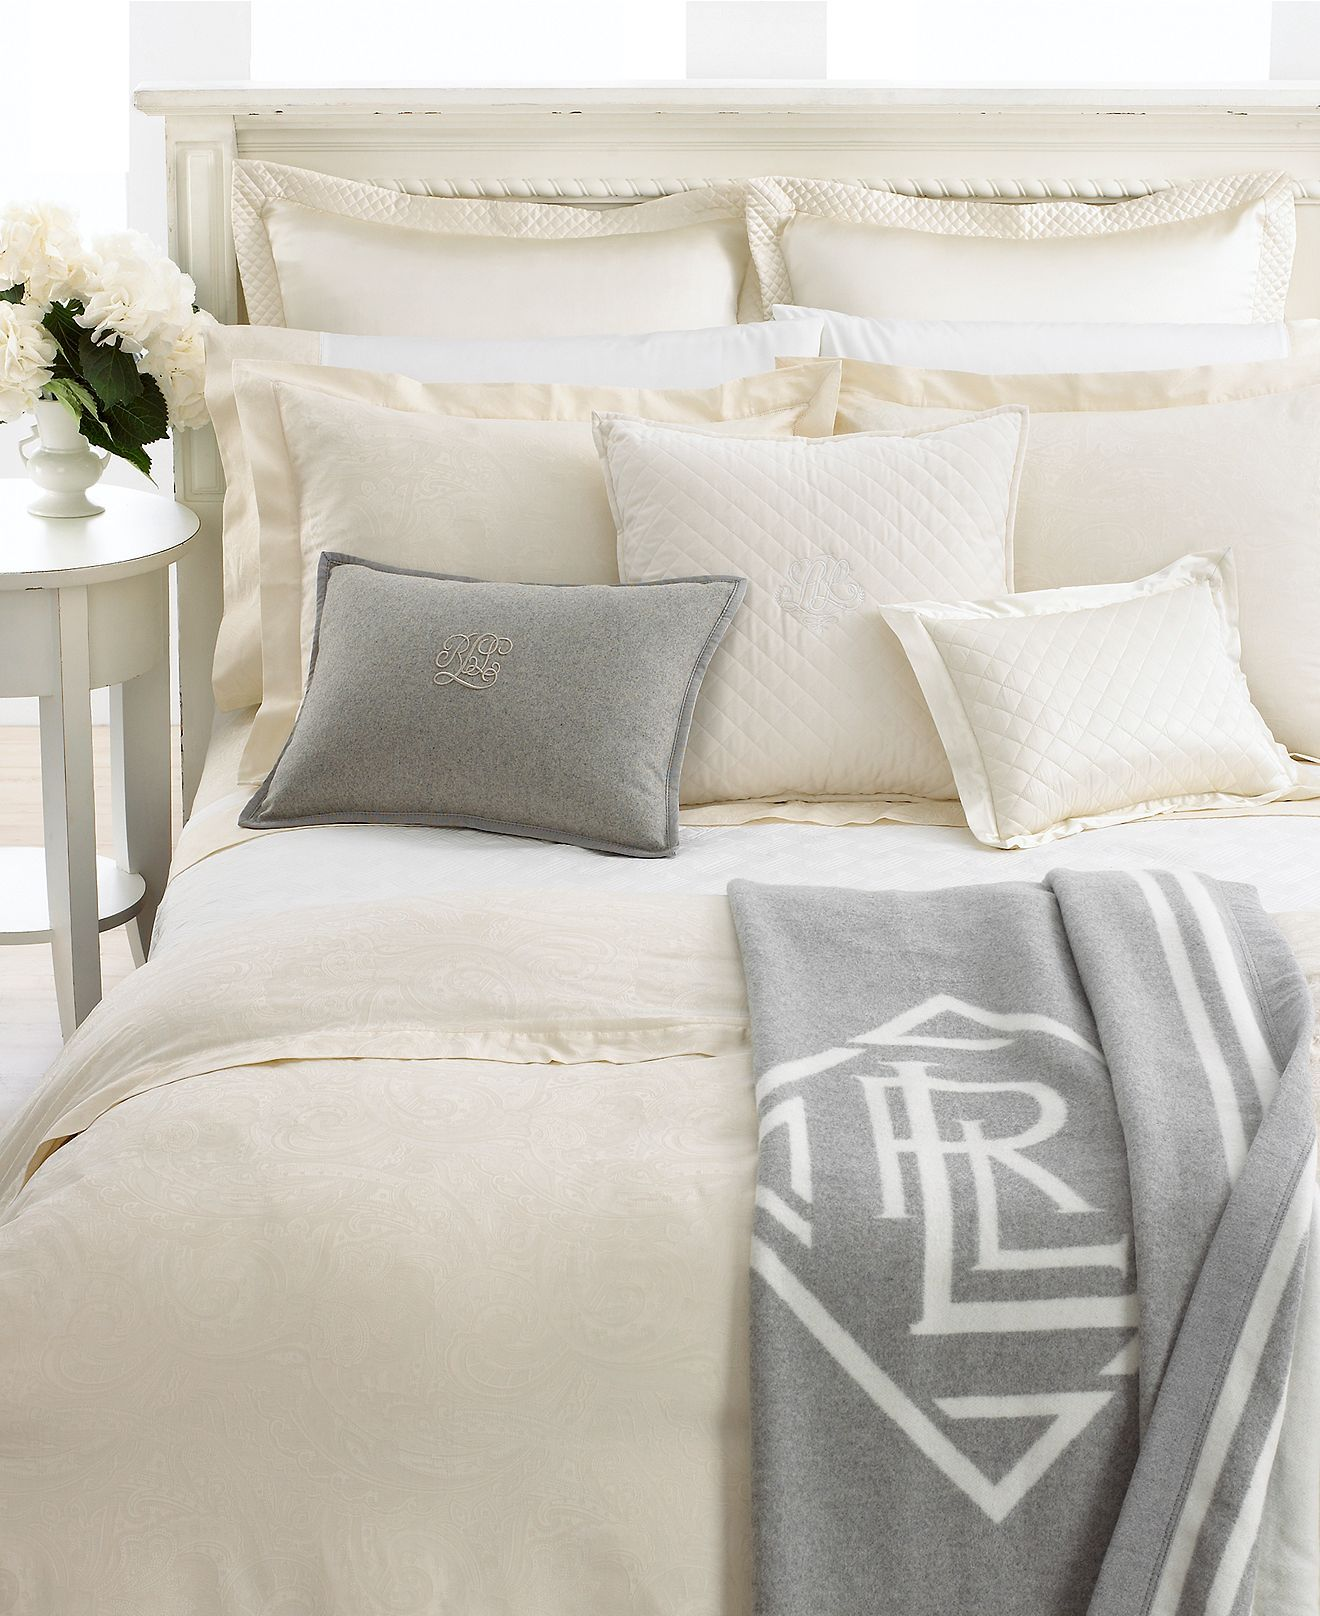 Ralph Lauren Bedding Bedroom Pinterest Bett Haus And Rund Ums